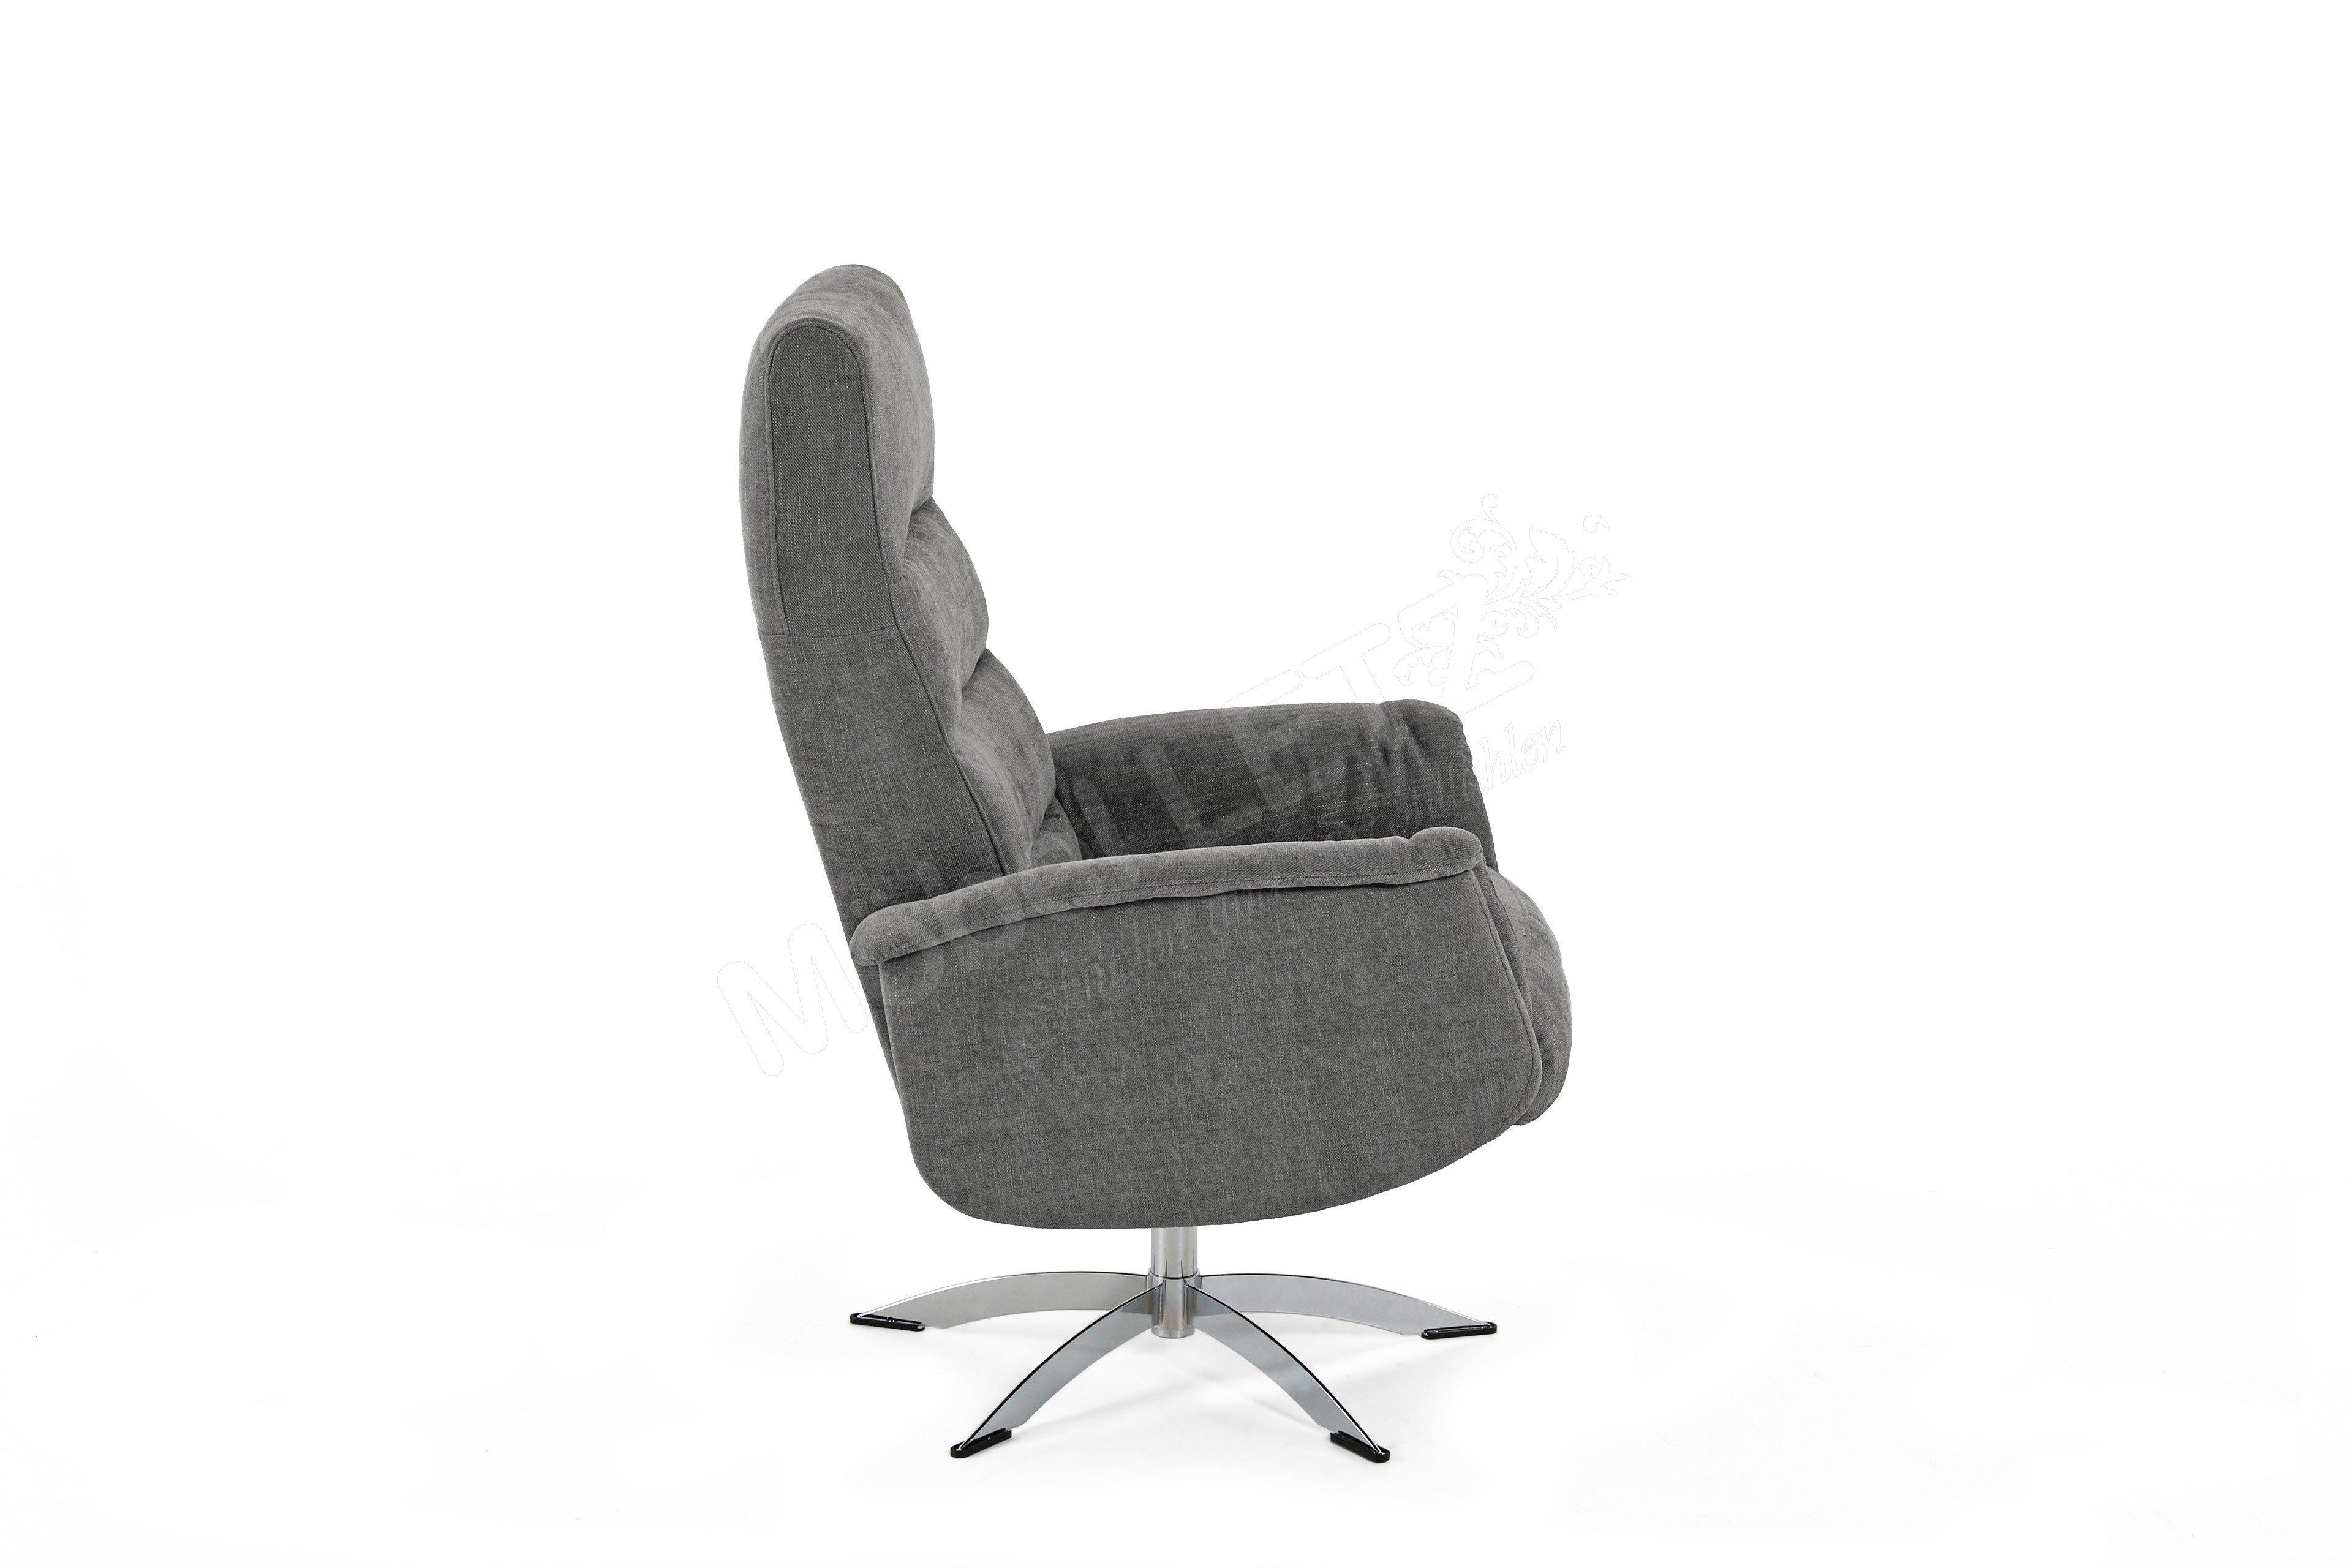 hjort knudsen 3252 relaxsessel dunkelgrau m bel letz ihr online shop. Black Bedroom Furniture Sets. Home Design Ideas